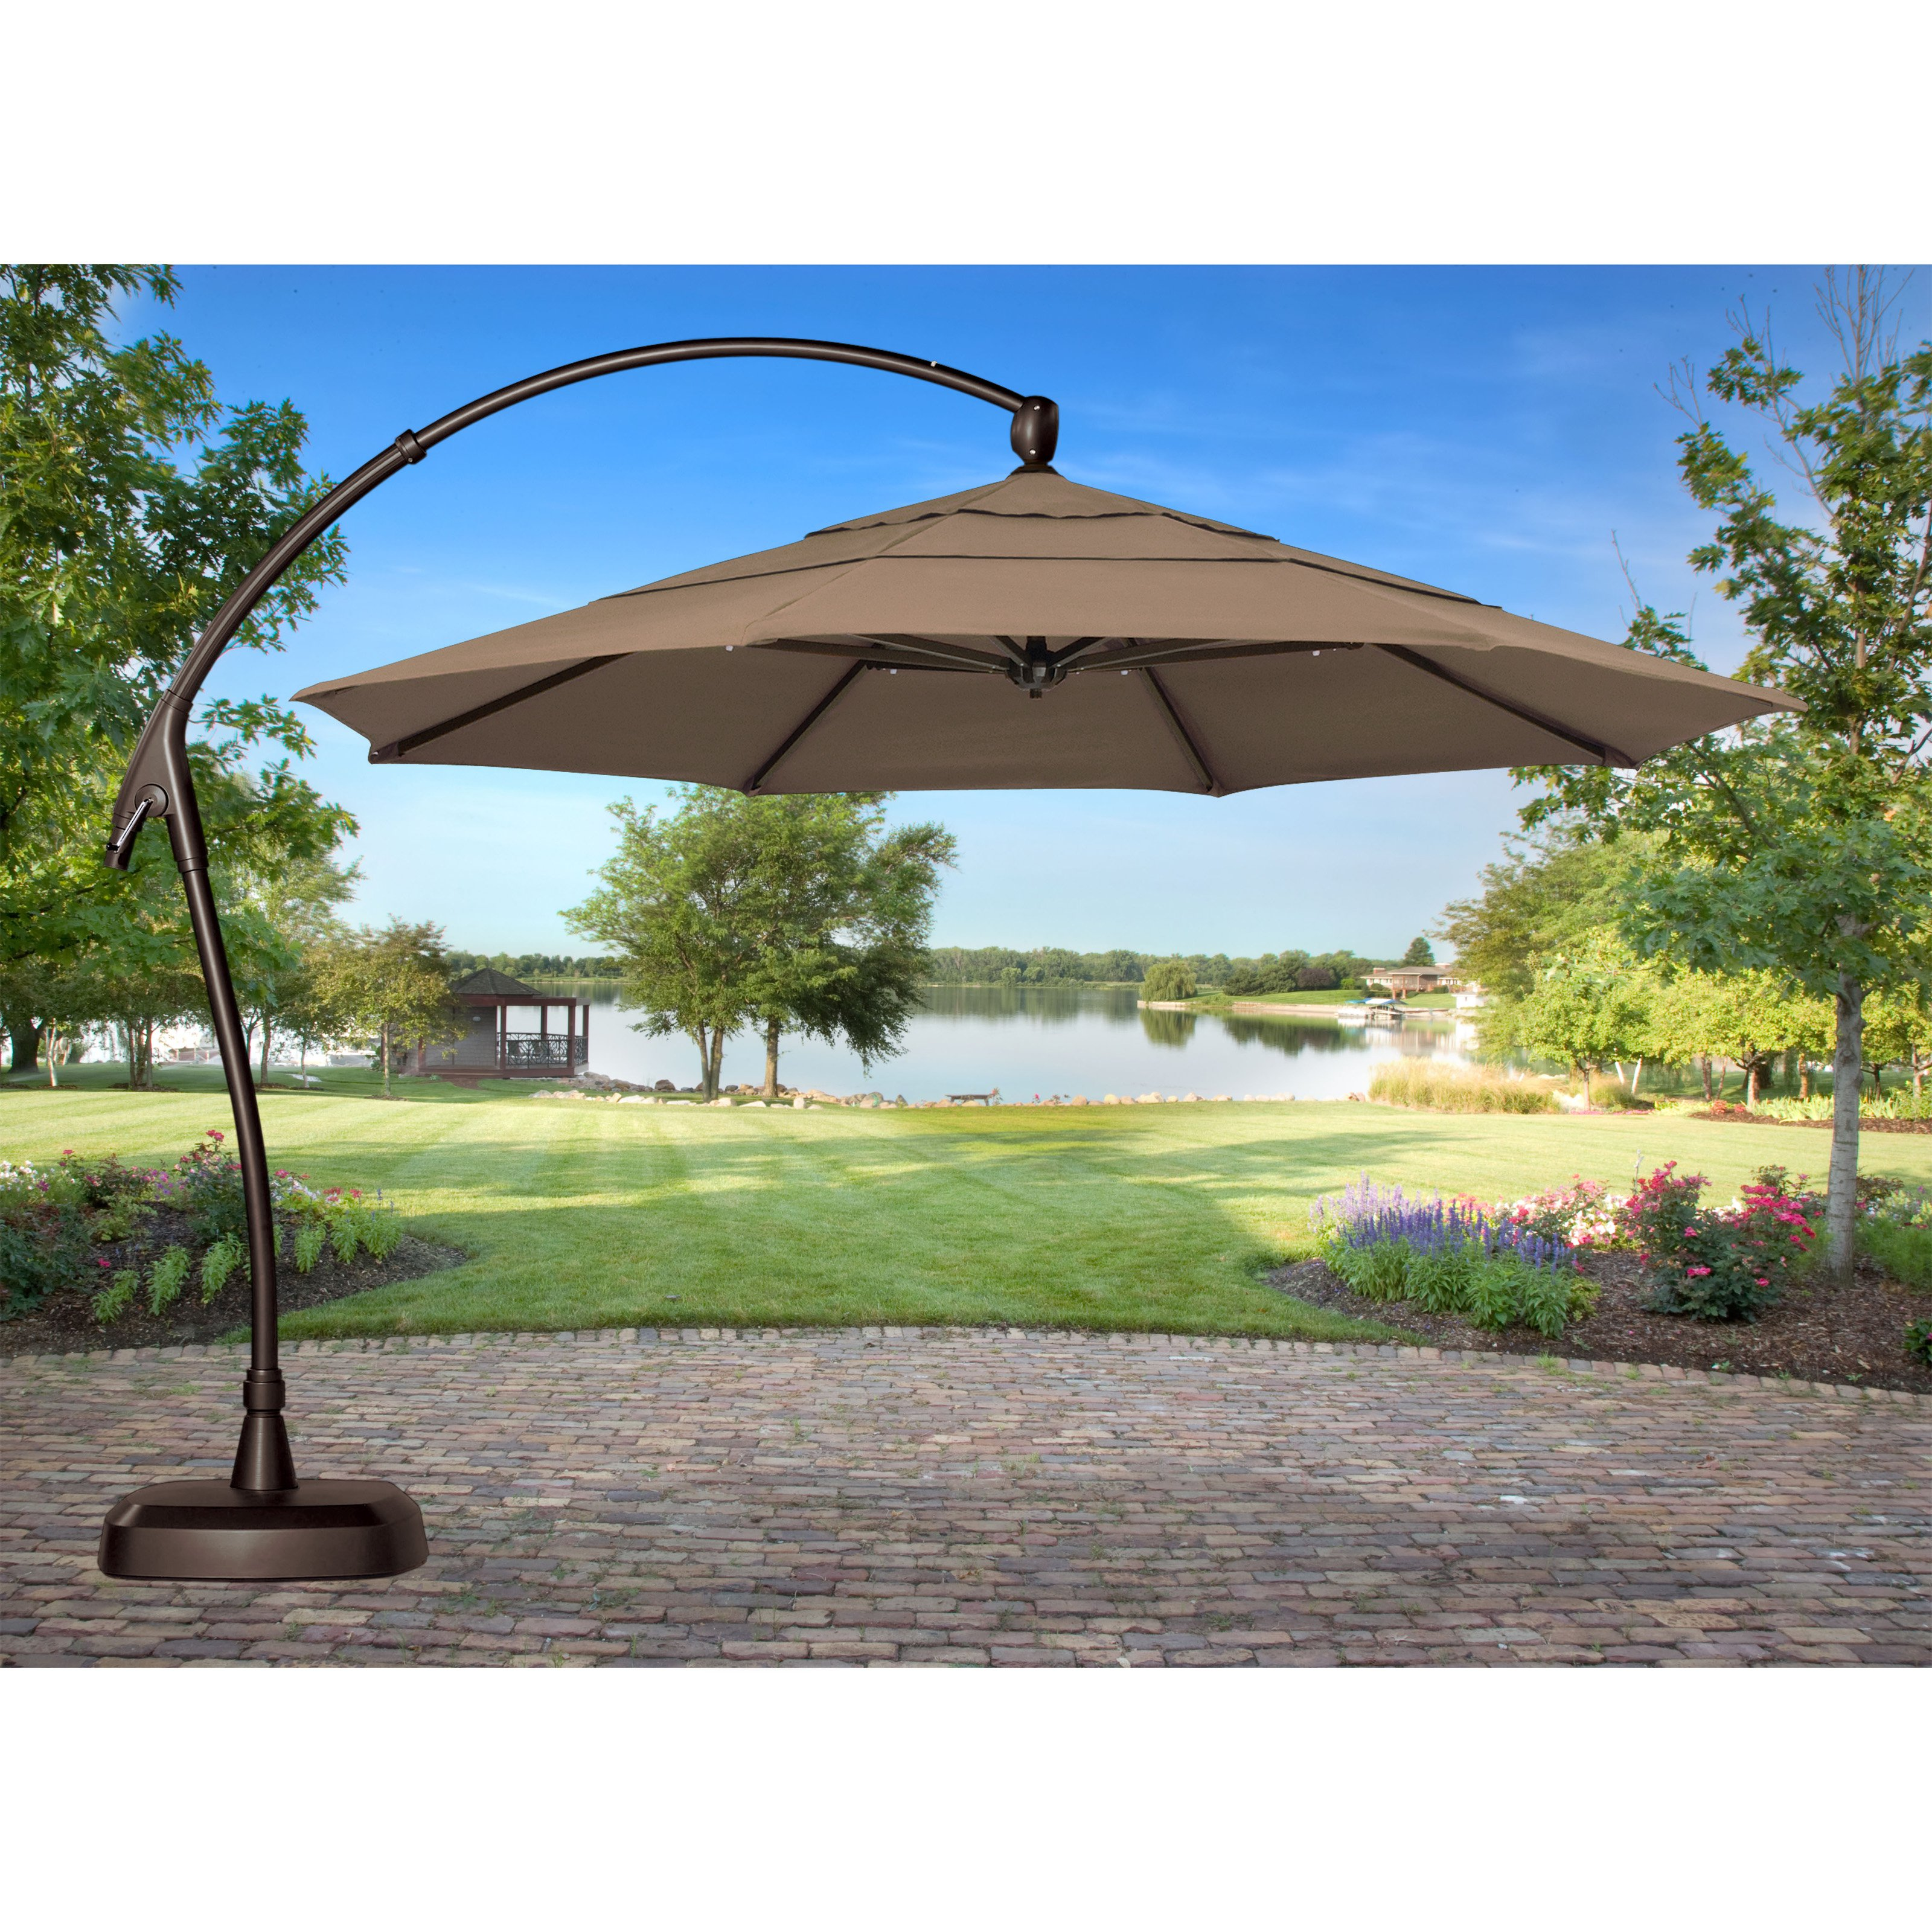 Marvelous Large Patio Umbrellas Cantilever